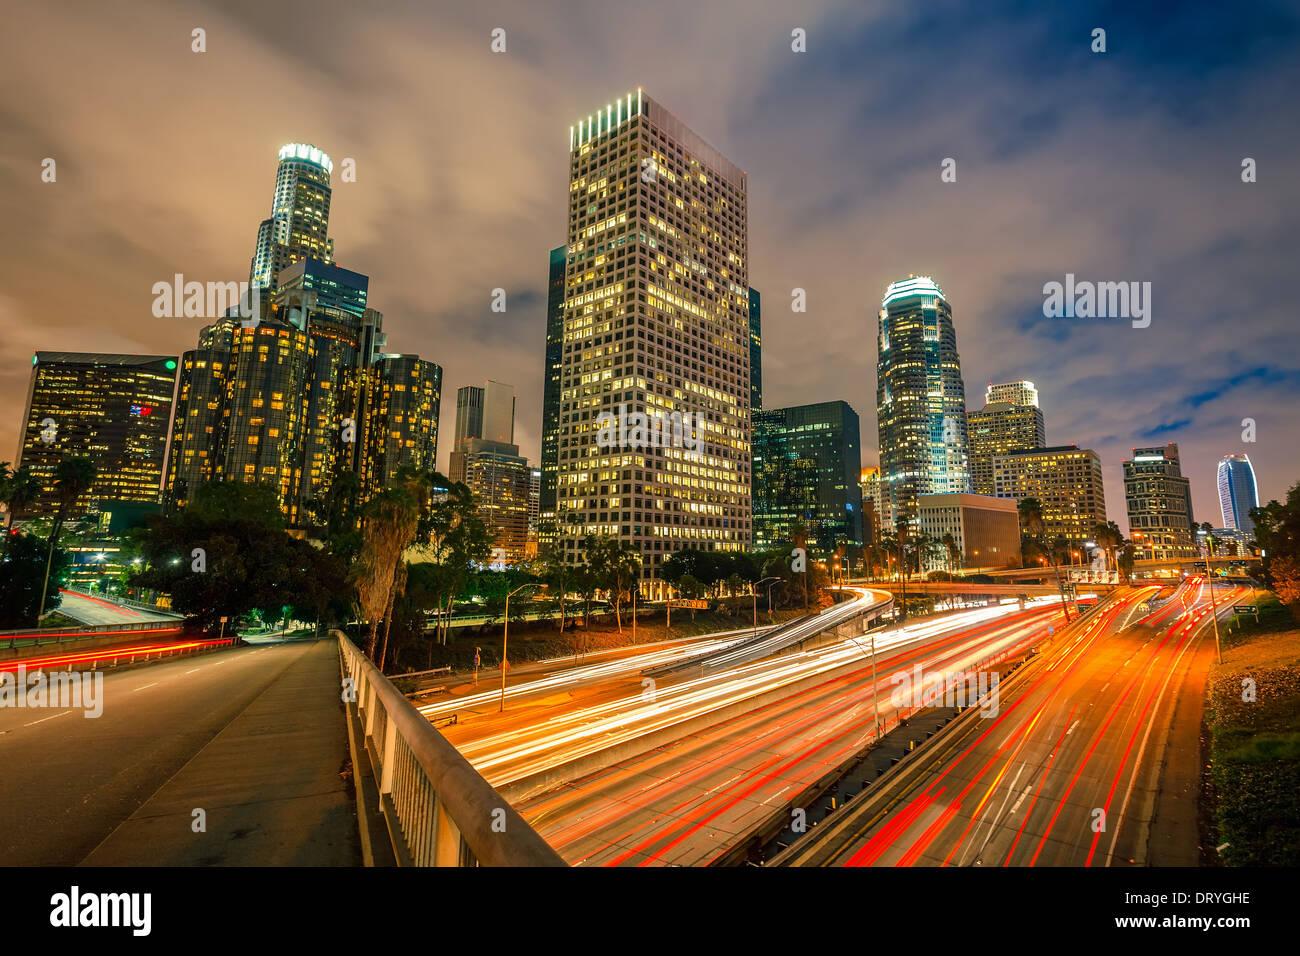 Los Angeles bei Nacht Stockbild